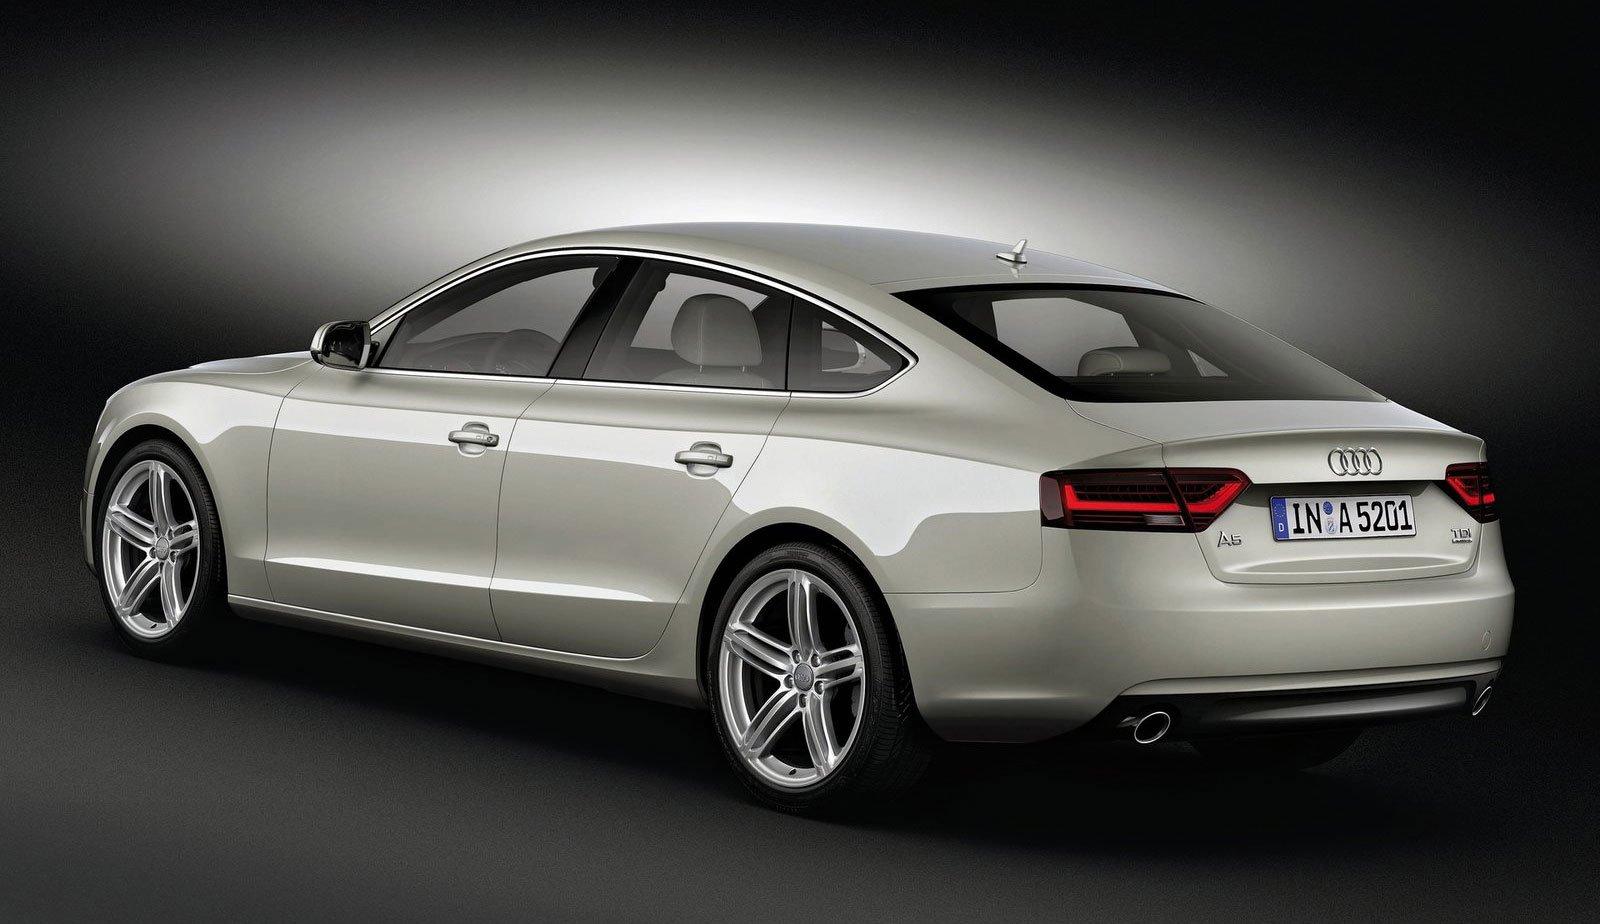 Kekurangan Audi A5 Sportback 2011 Spesifikasi